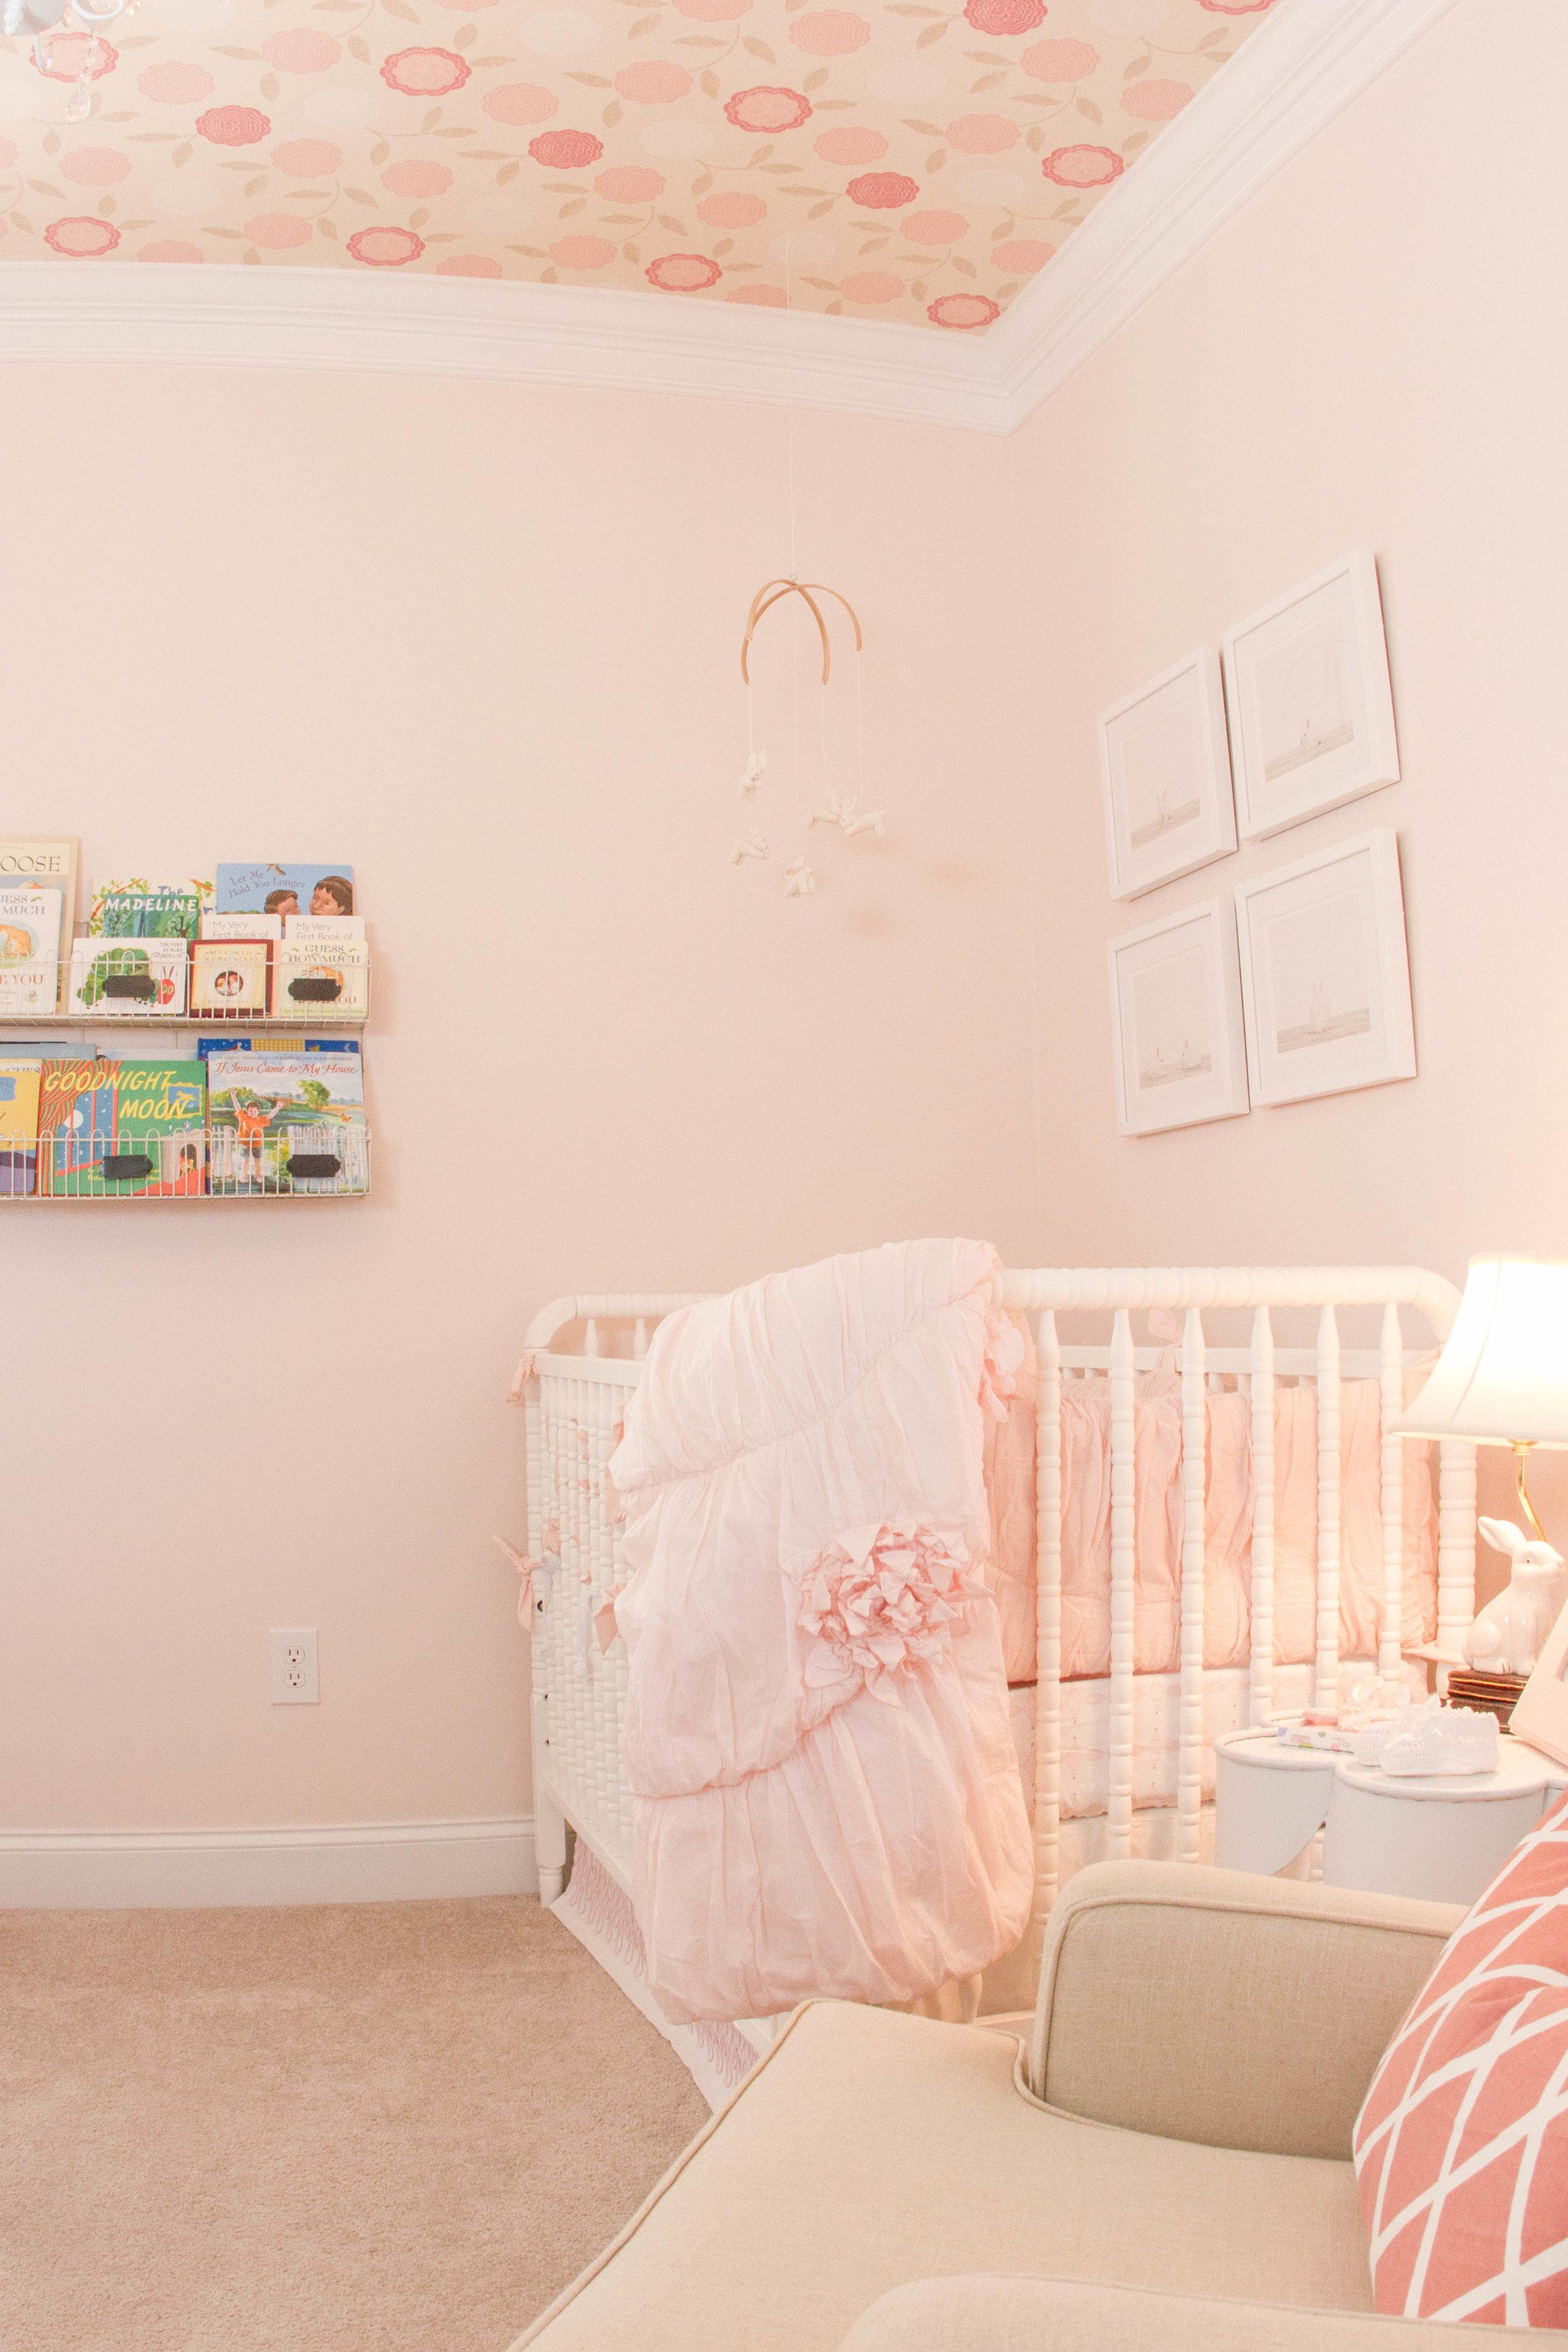 ellebrightdesigns.floralwallpaper.wallpaperceiling.pinknursery